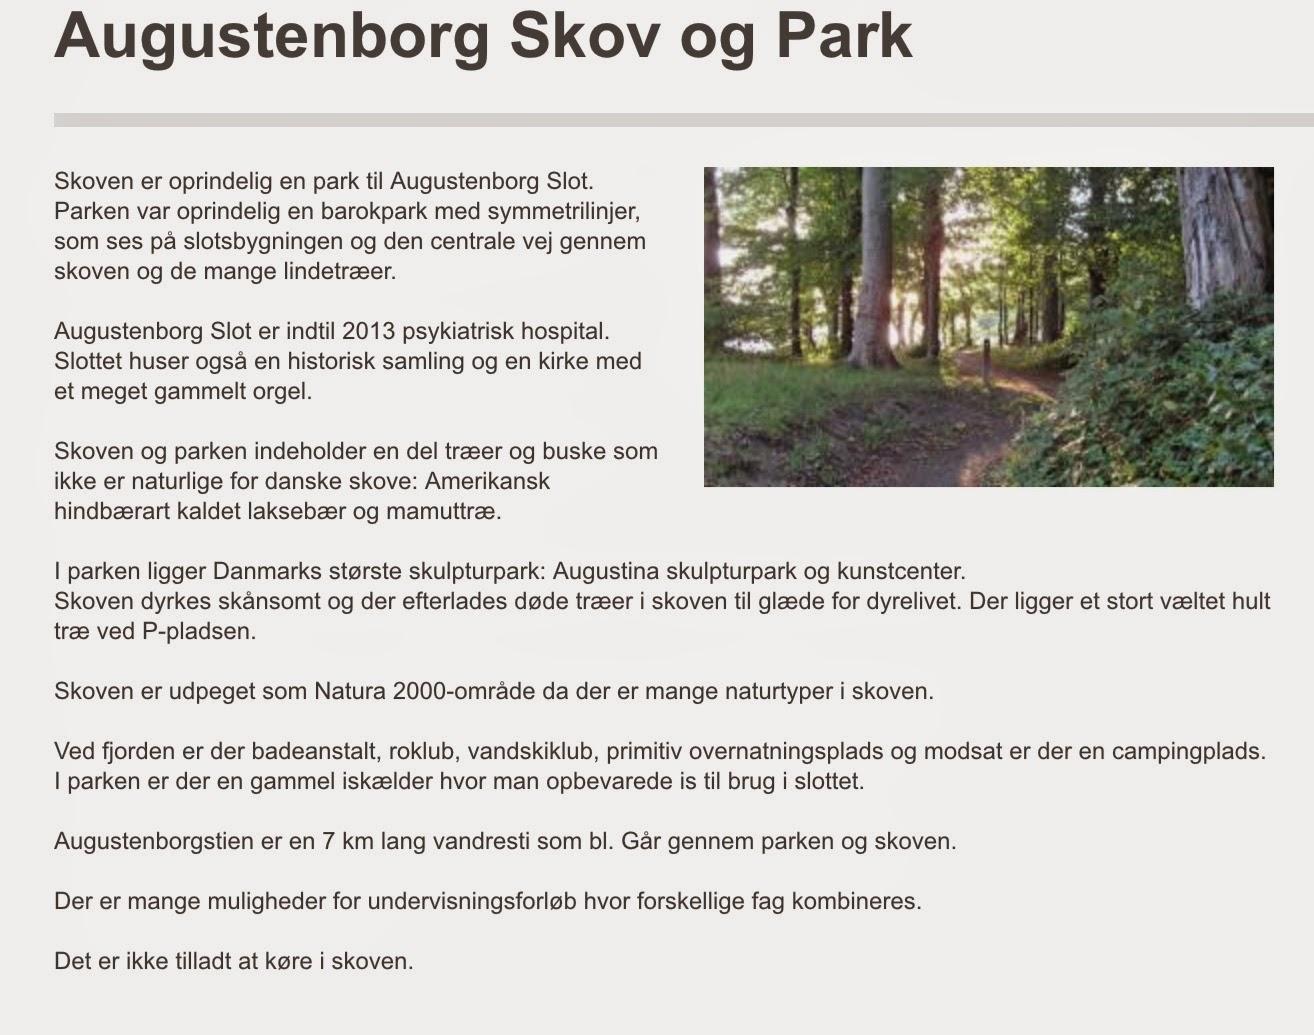 psykiatrisk hospital fjorden